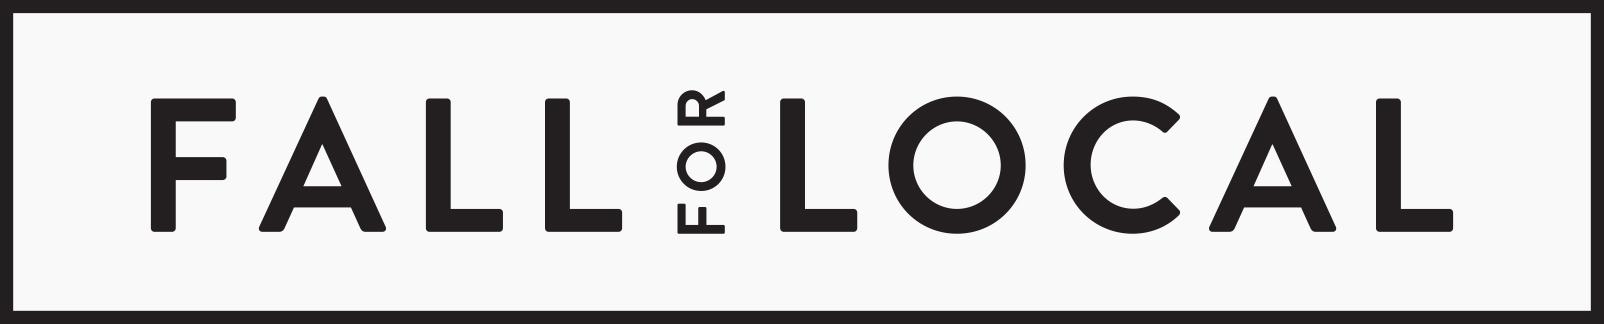 fallforlocal-logo.jpg